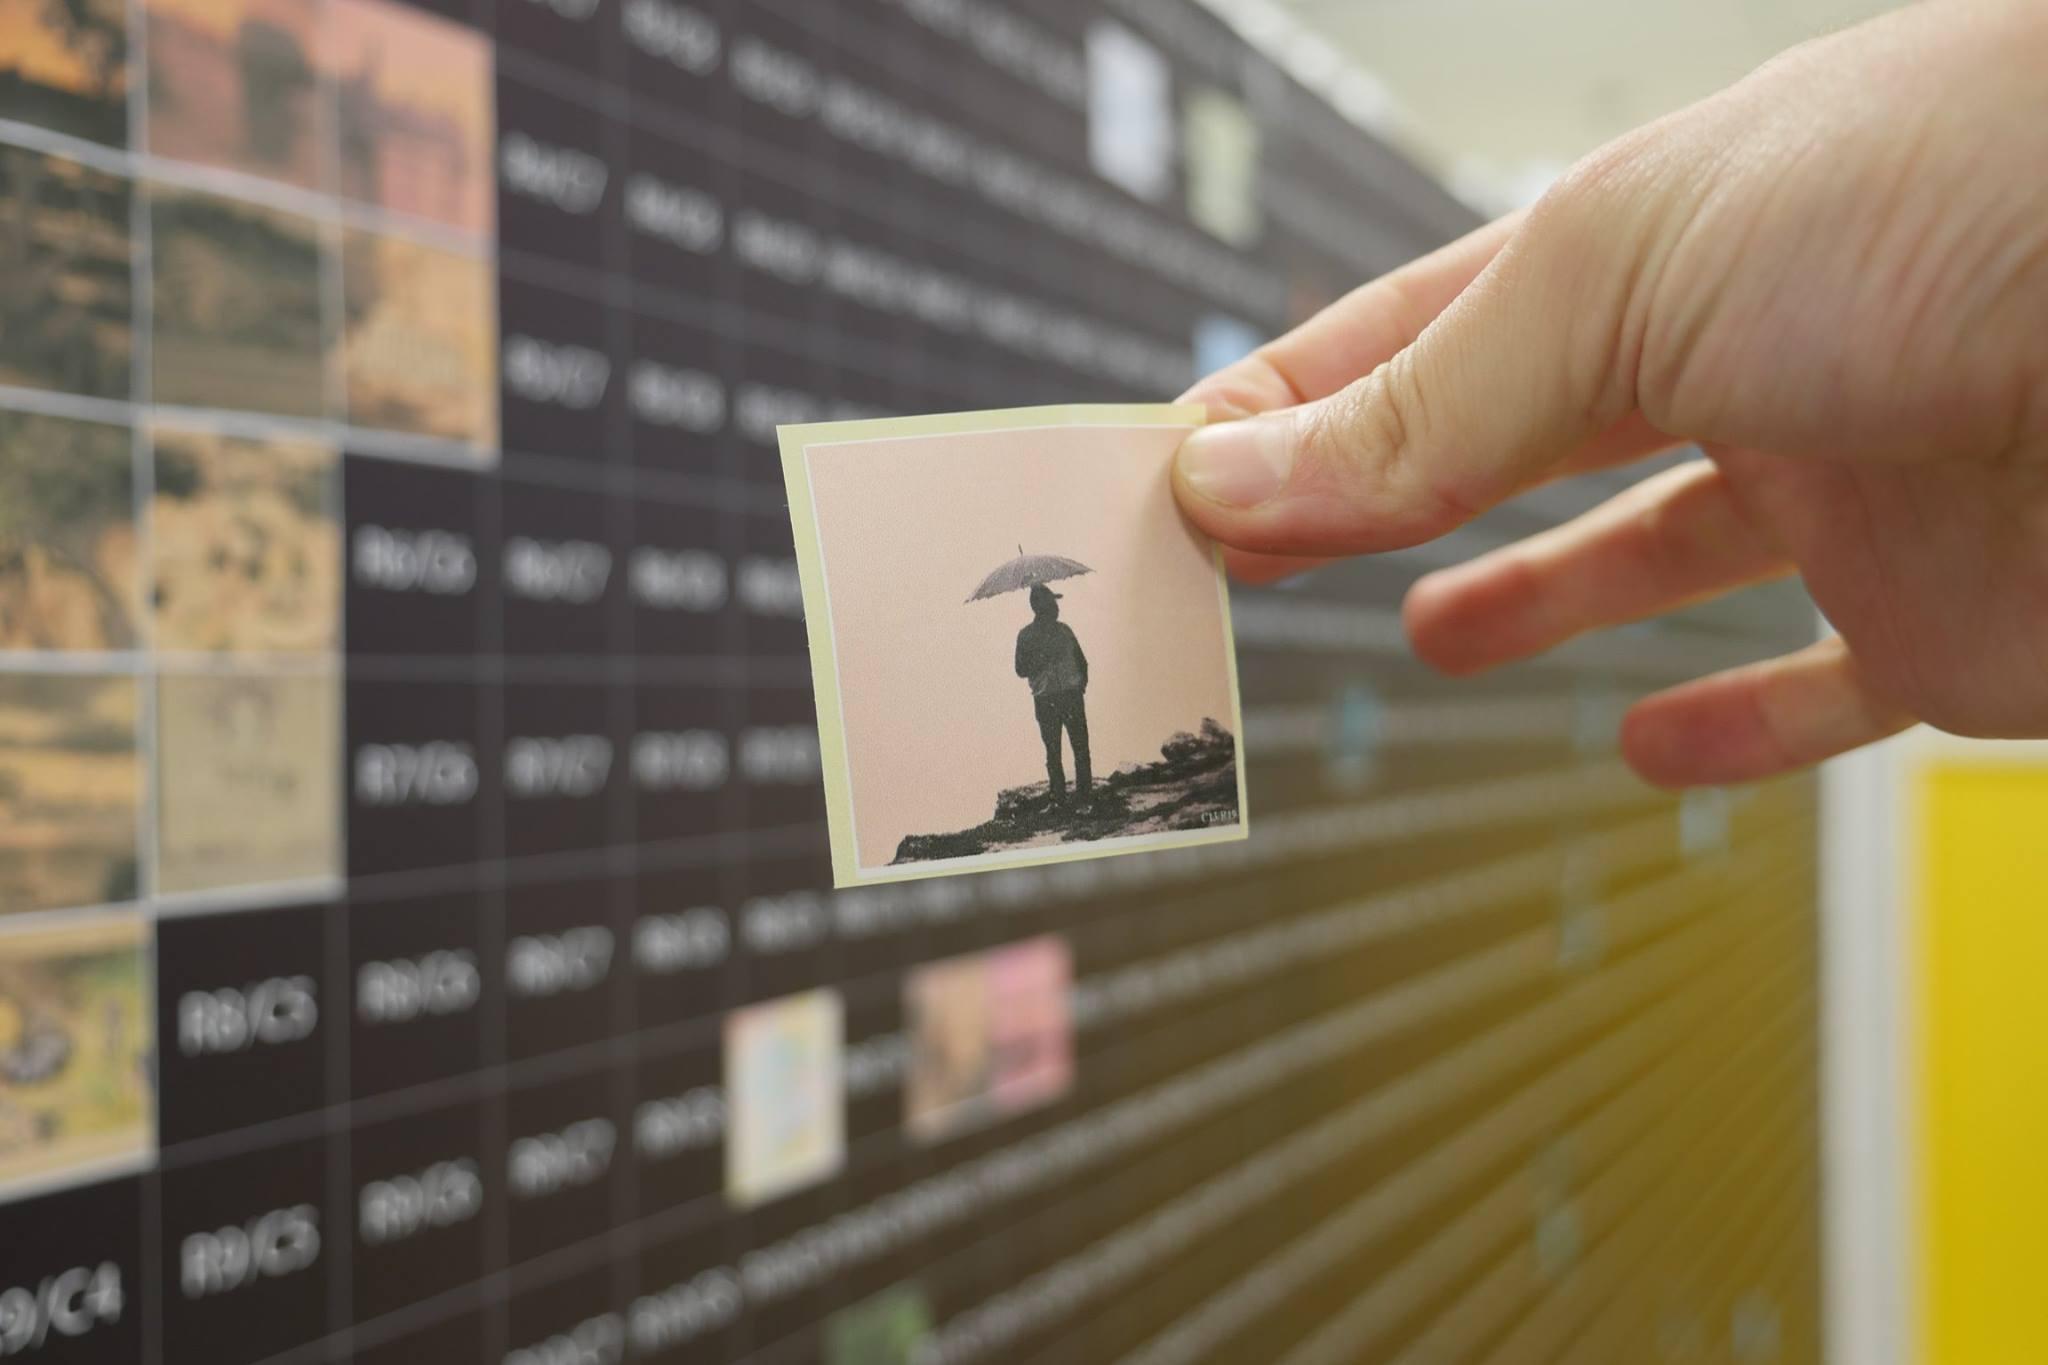 Photo Mosaic image with code.jpg